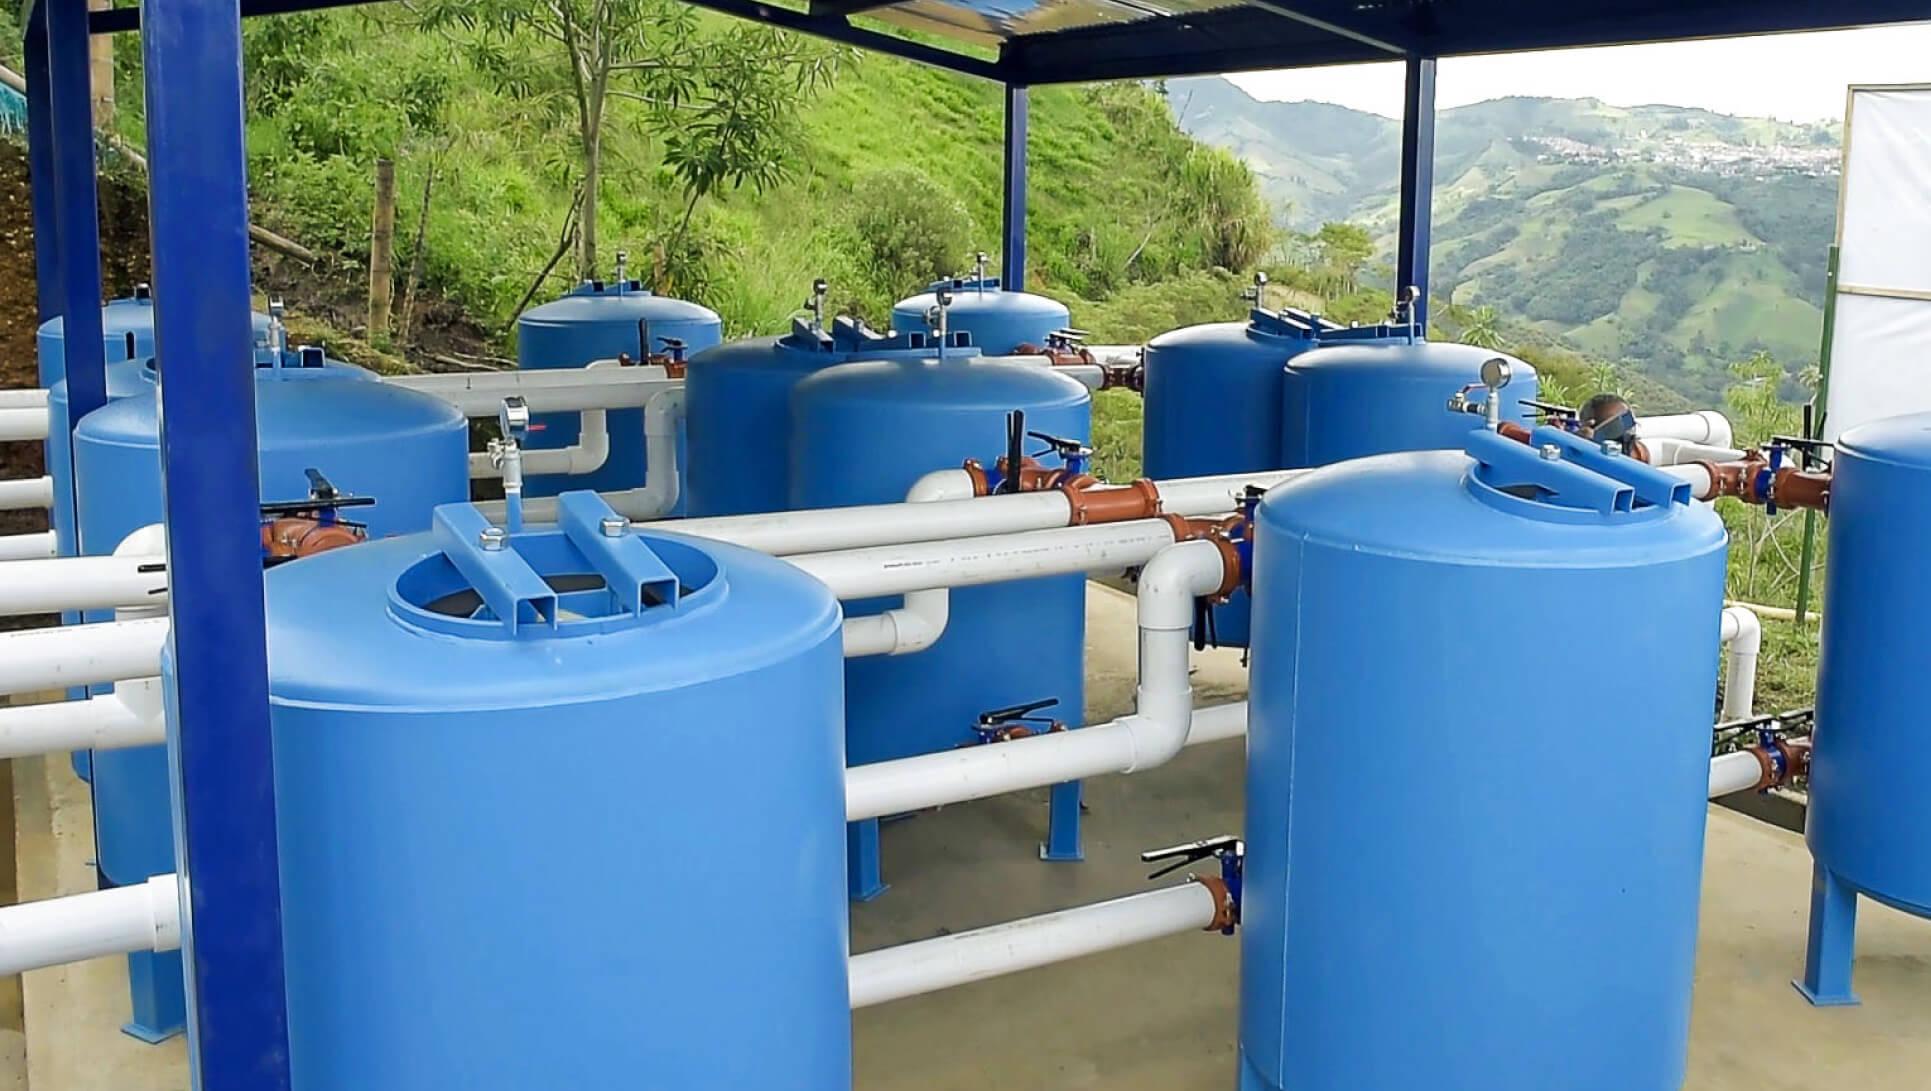 Wakate aporta a la solución del problema histórico del agua en Neira